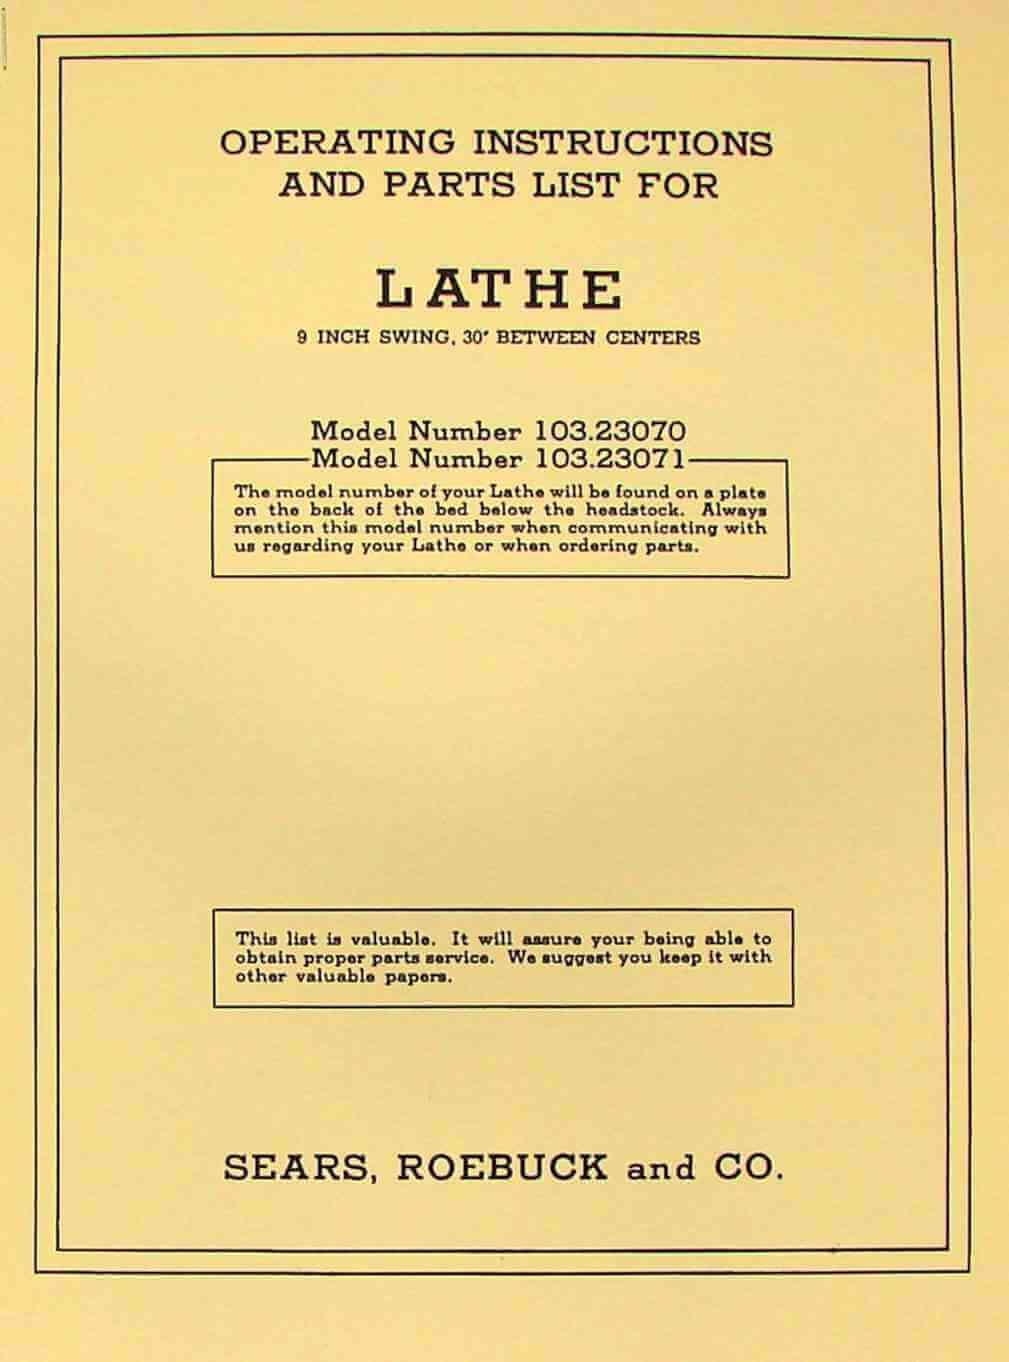 CRAFTSMAN 103.23070 103.23071 Wood Lathe Instructions & Parts Manual |  Ozark Tool Manuals & Books